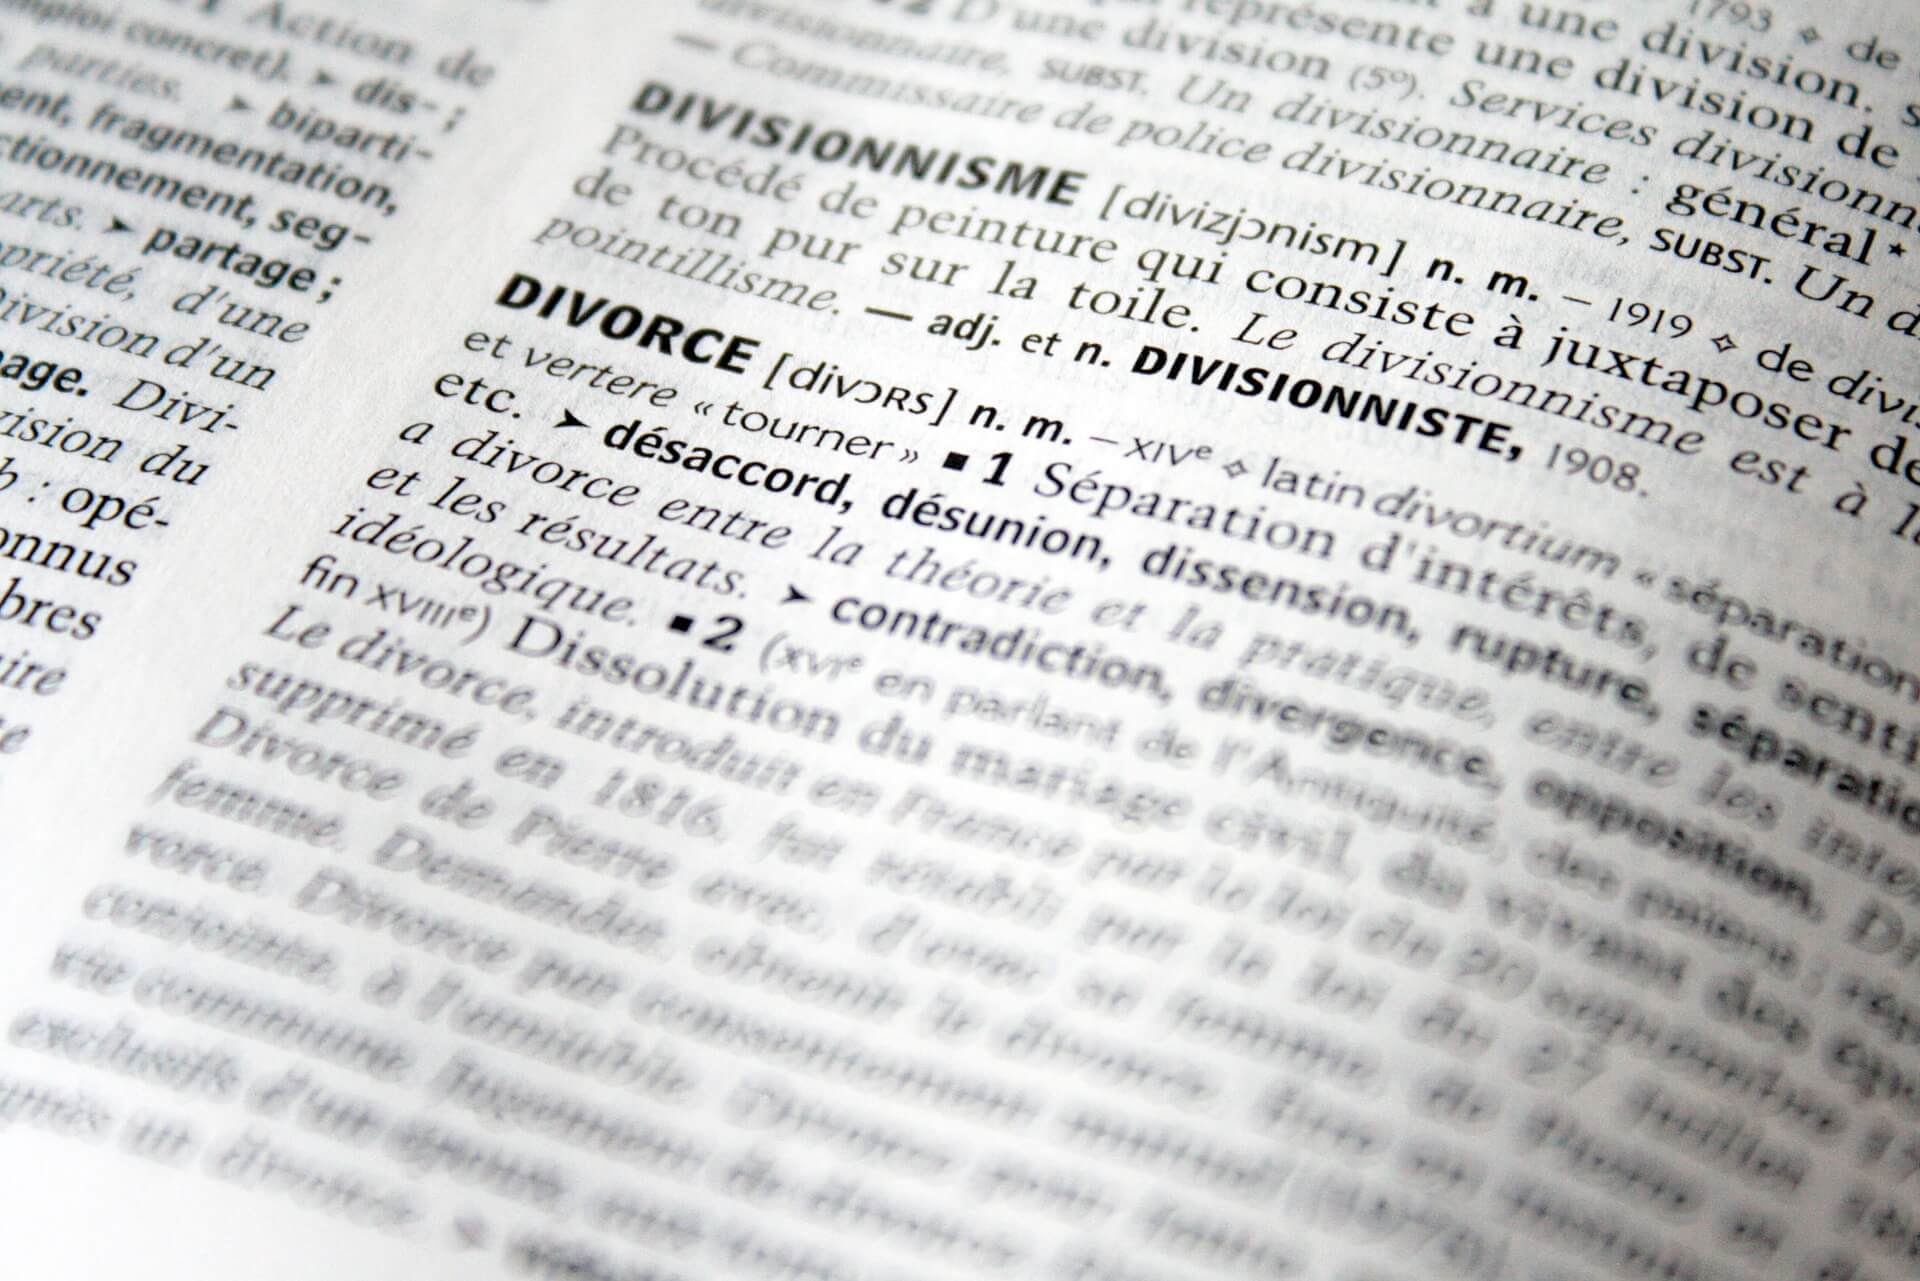 Abogados para divorcios en Tenerife